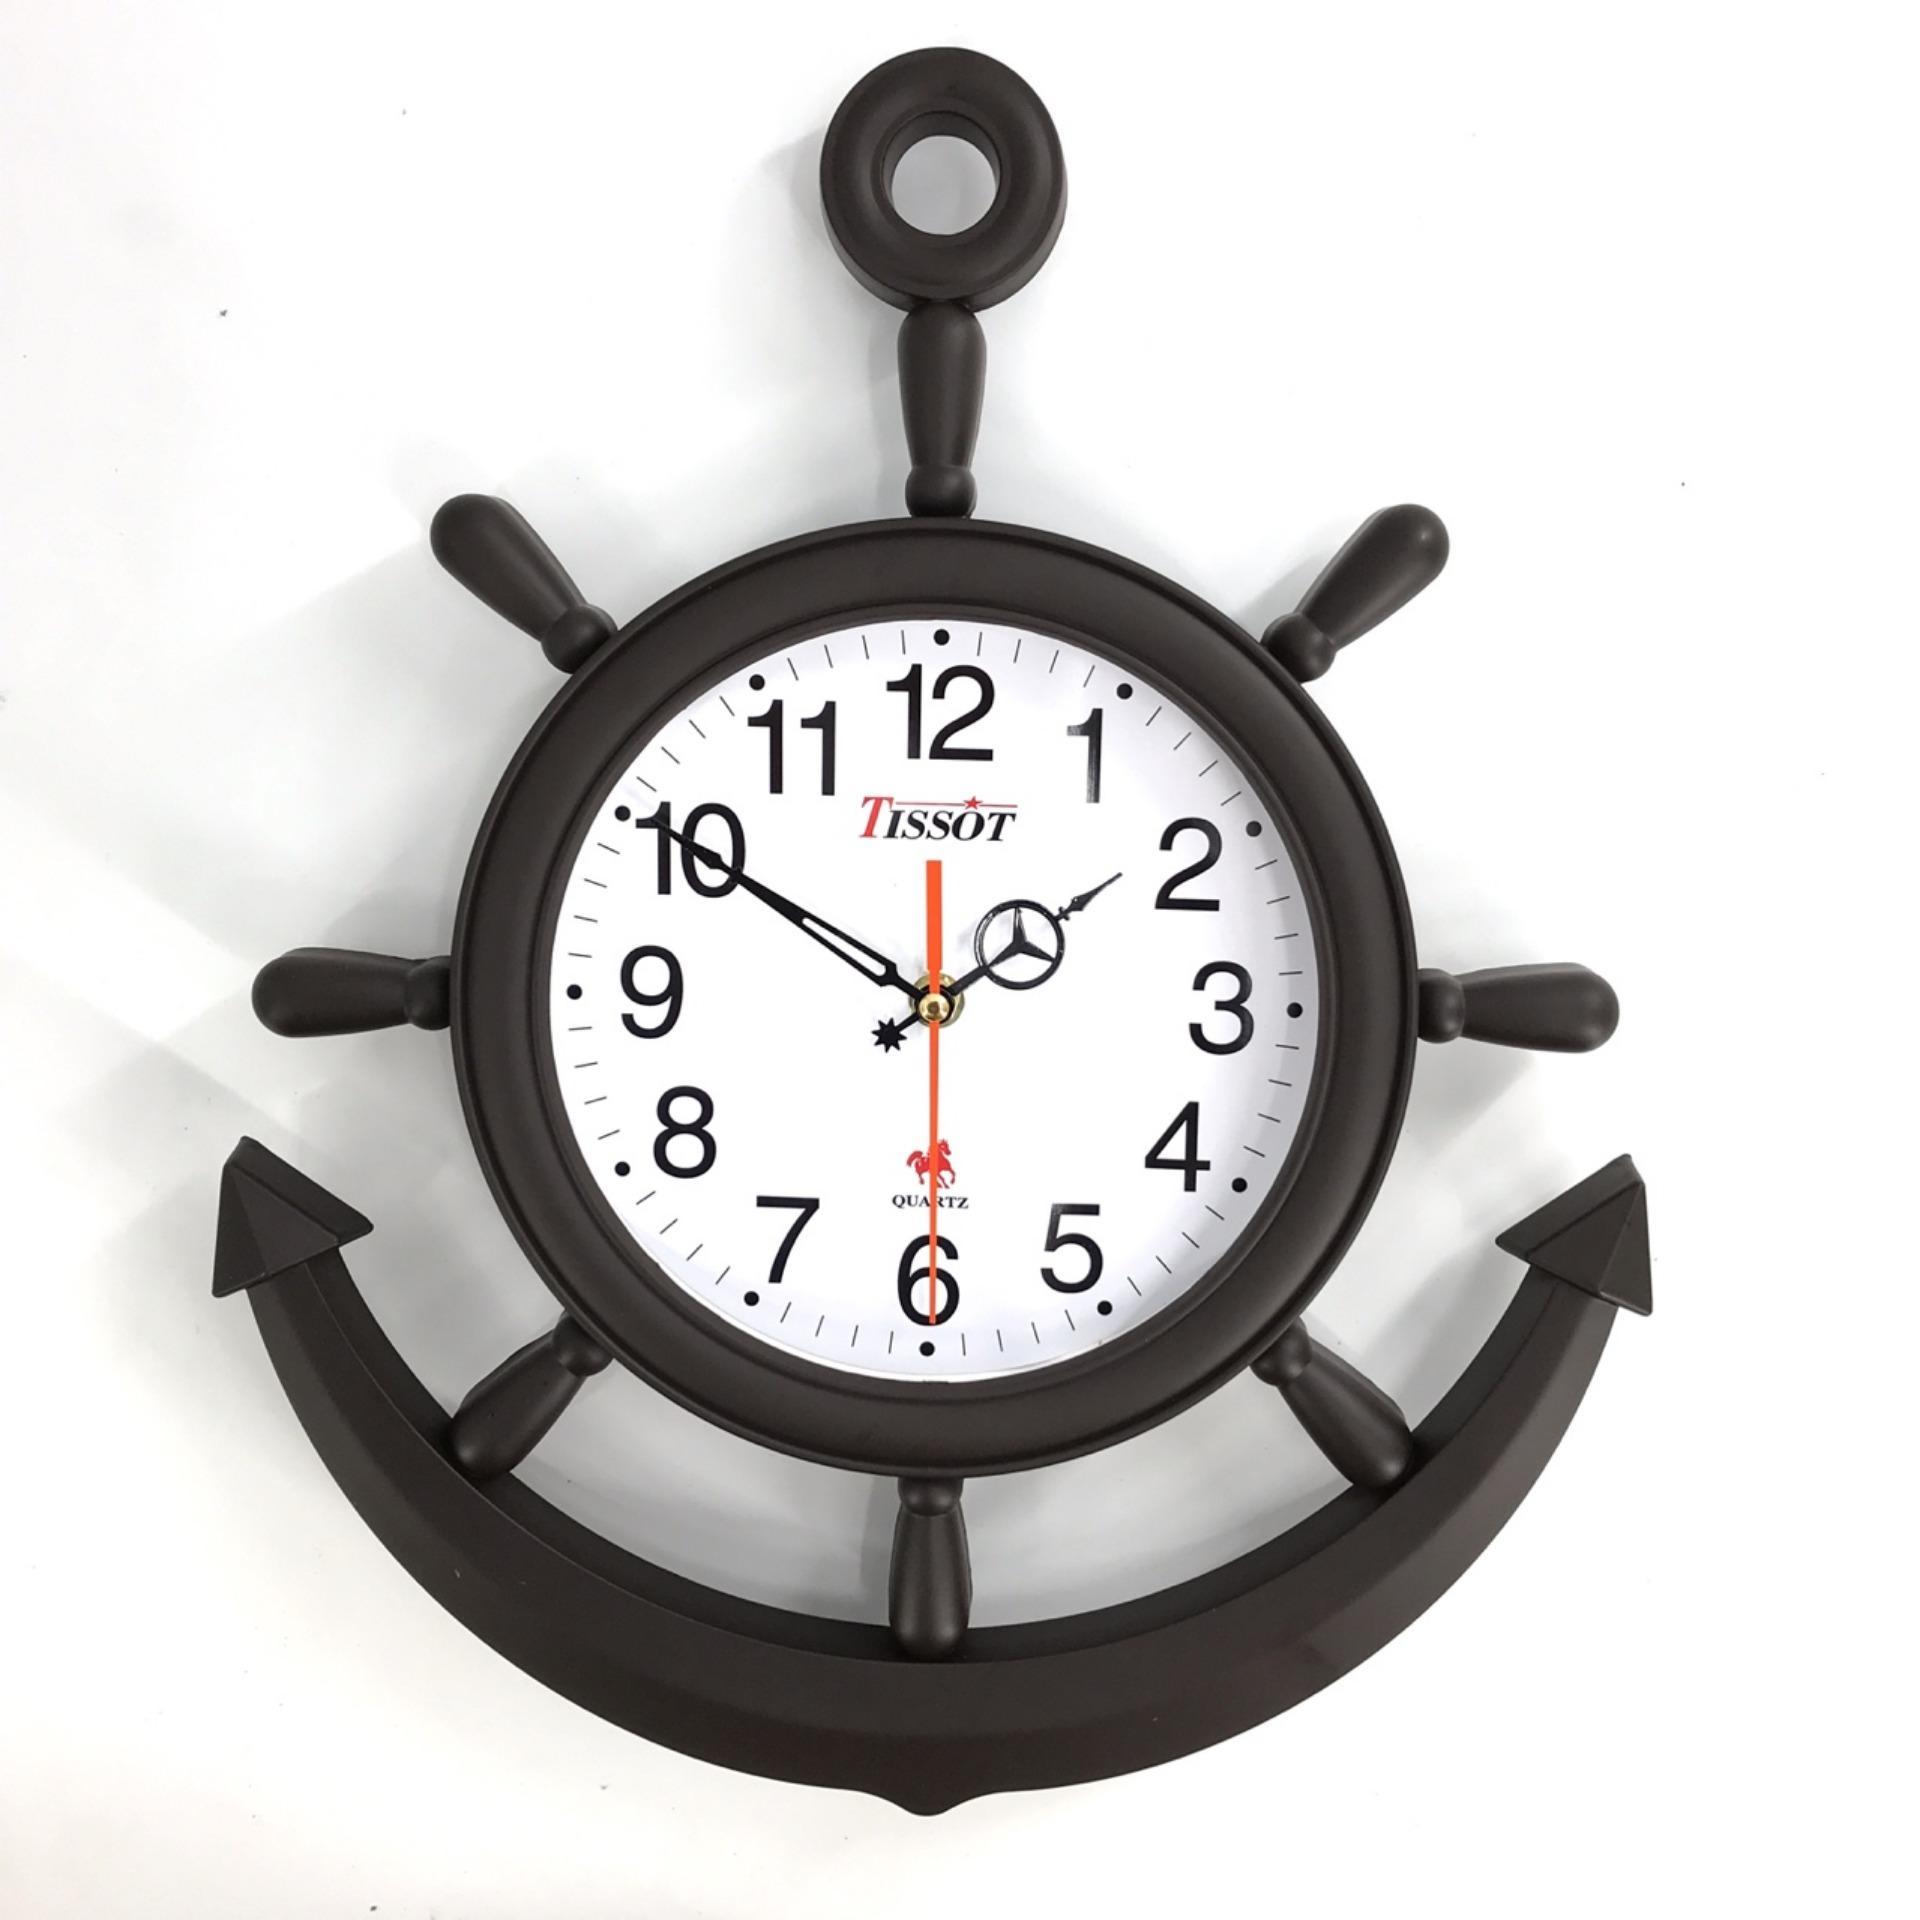 Nơi bán [ VATI] Đồng hồ treo tường mỏ neo S104